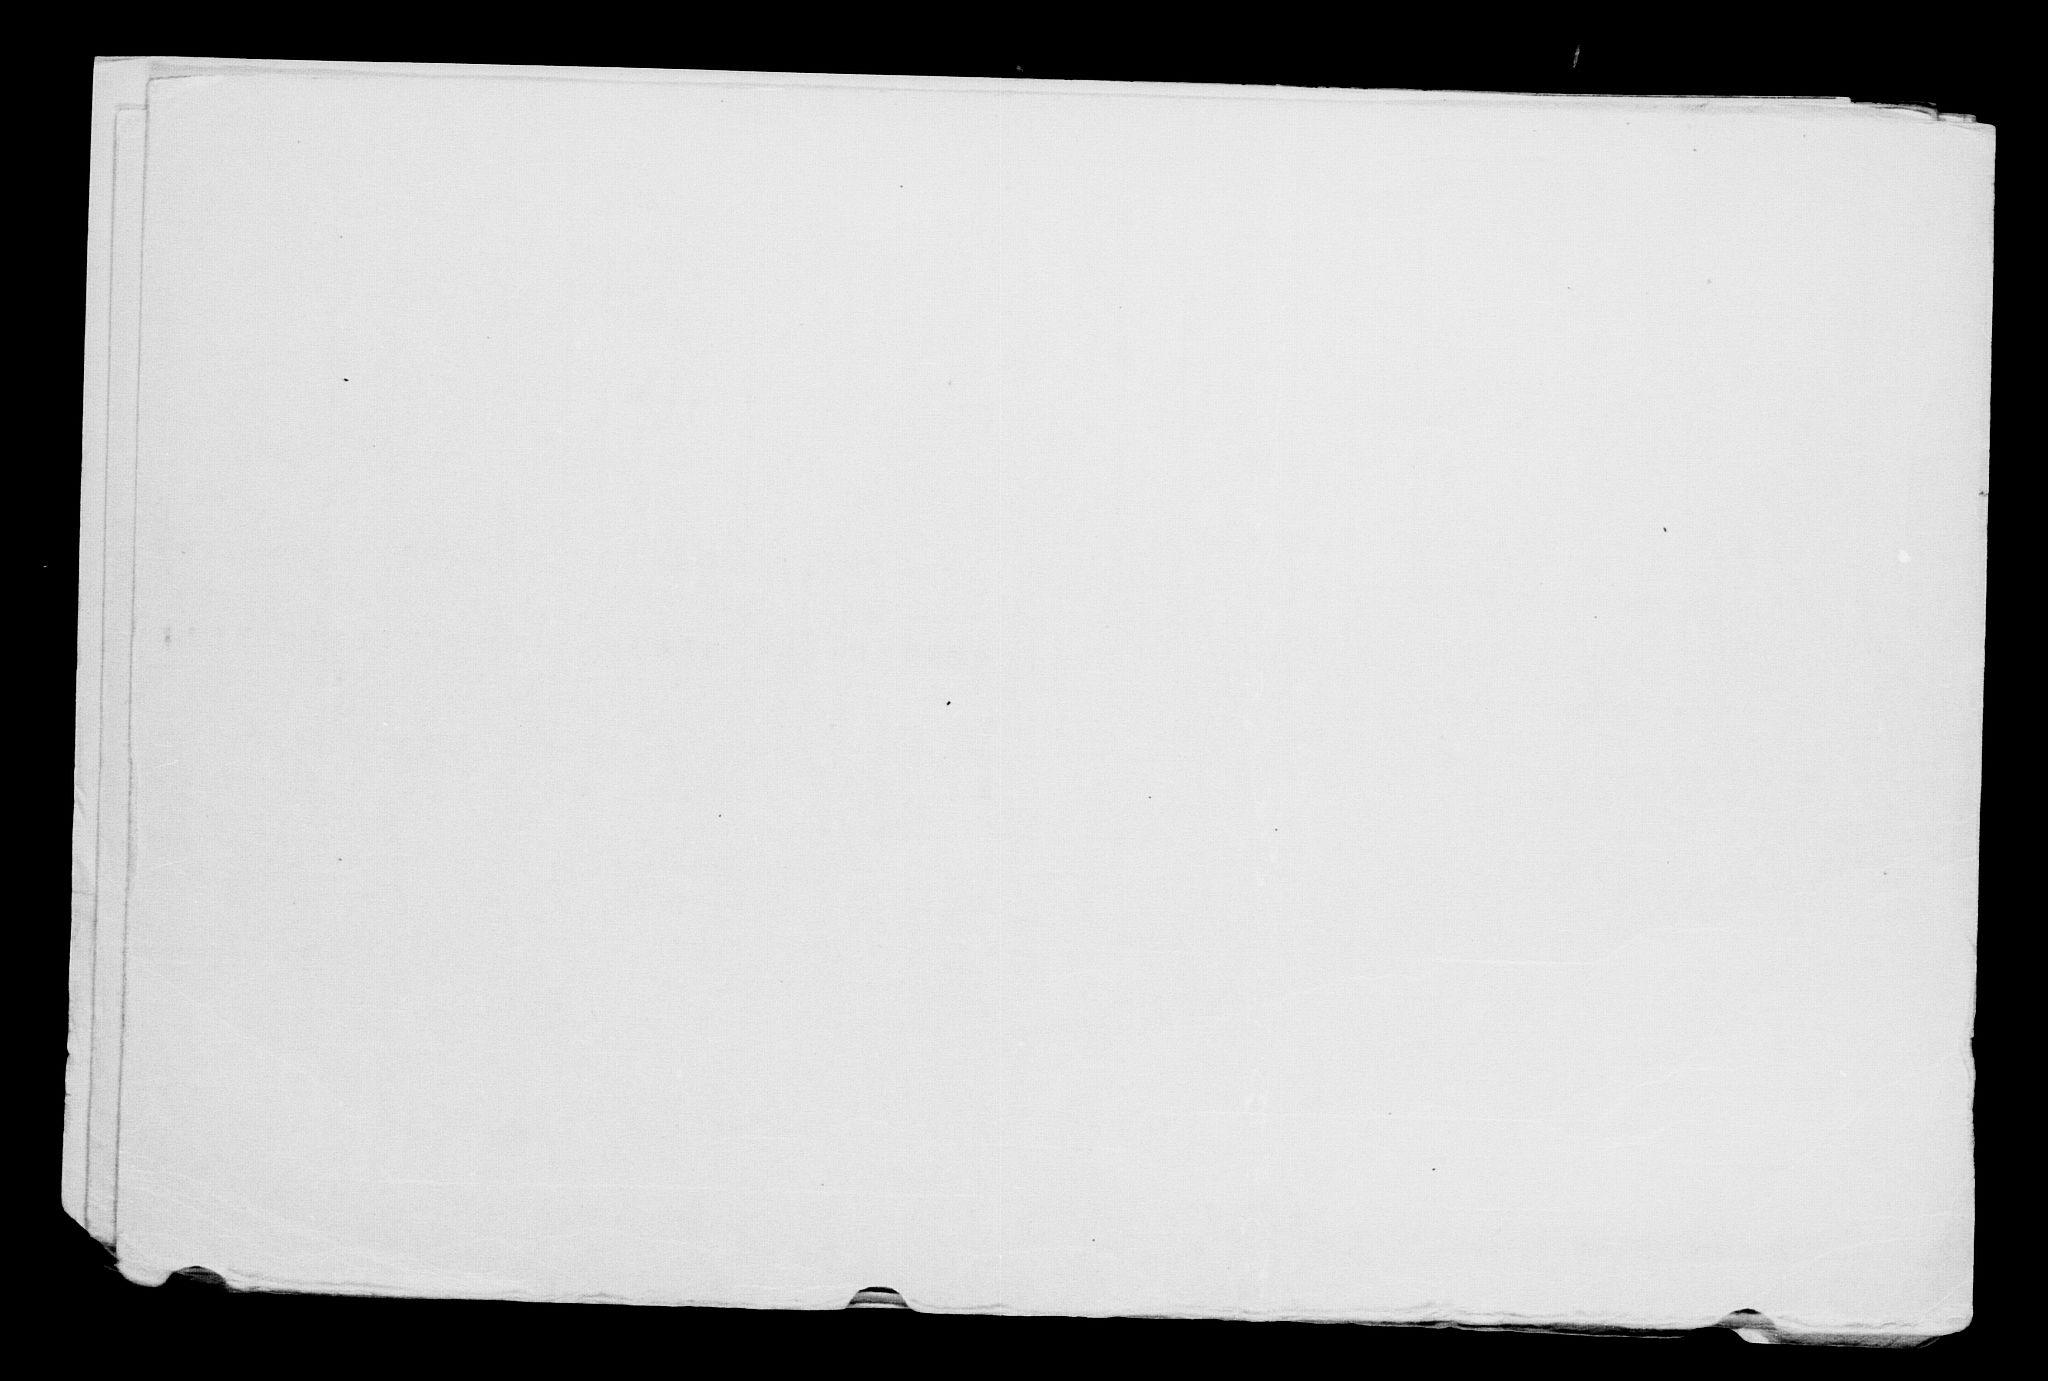 RA, Direktoratet for sjømenn, G/Gb/L0002: Hovedkort, 1883-1885, s. 2